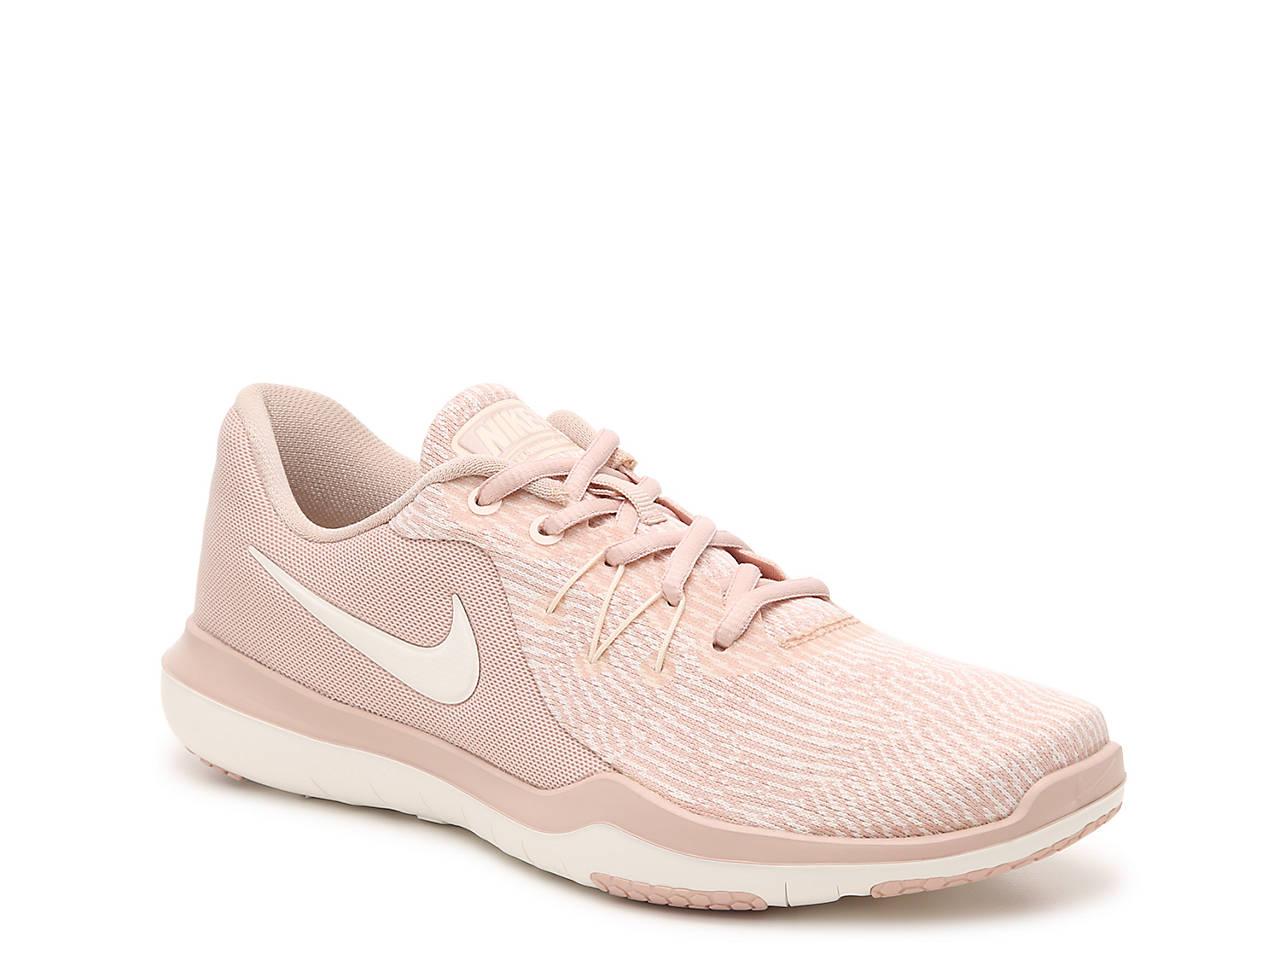 cheap for discount 113c4 6bfd0 Nike. Flex Supreme 6 Lightweight Training Shoe - Women s